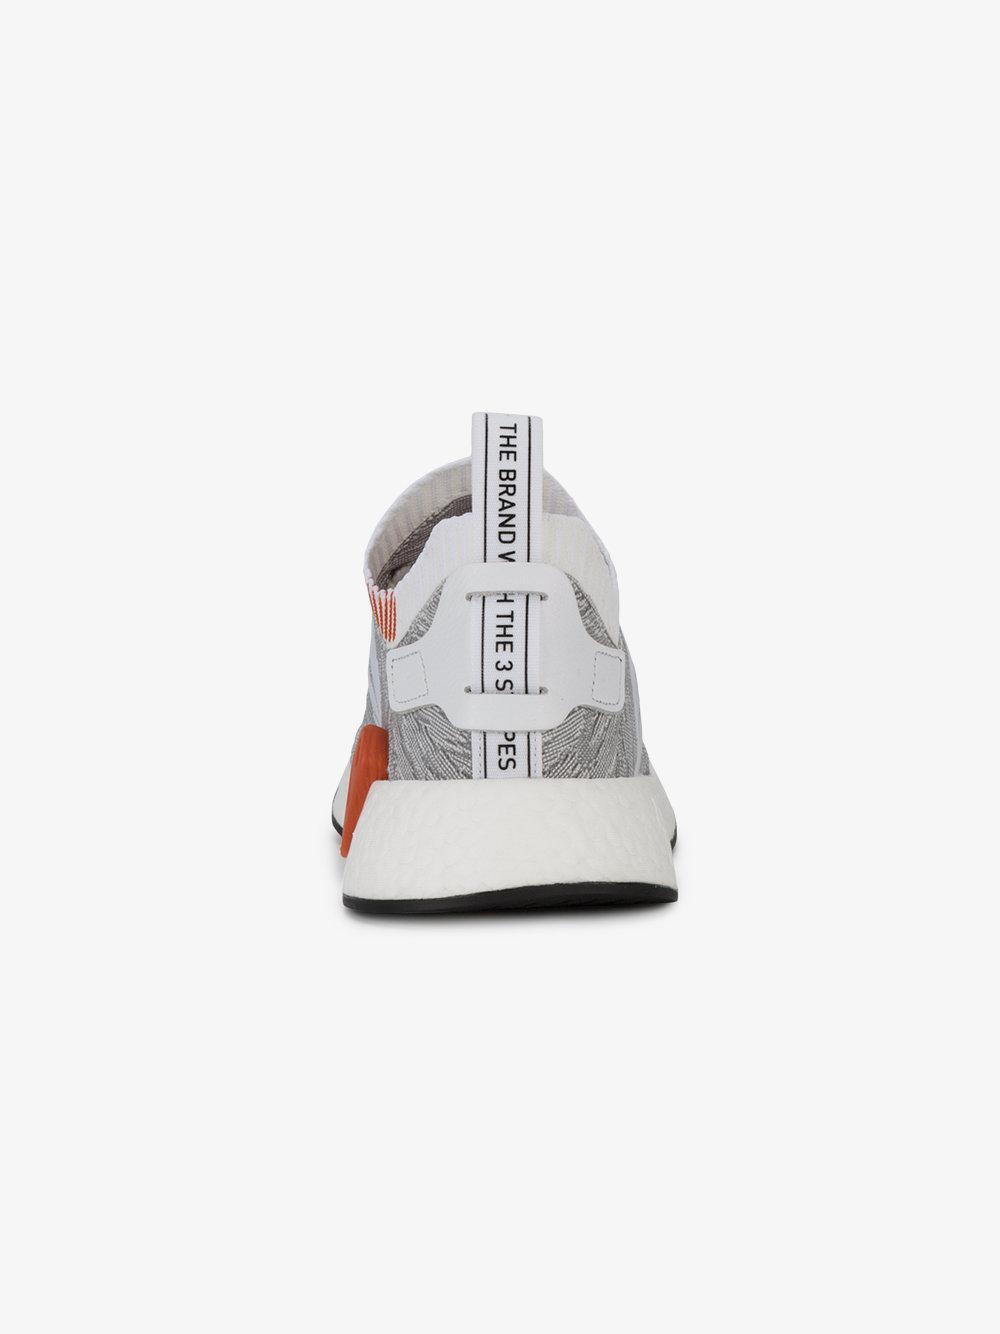 b7f43f21f843c Lyst - adidas Nmd R2 Primeknit Leopard Sneakers in Gray for Men